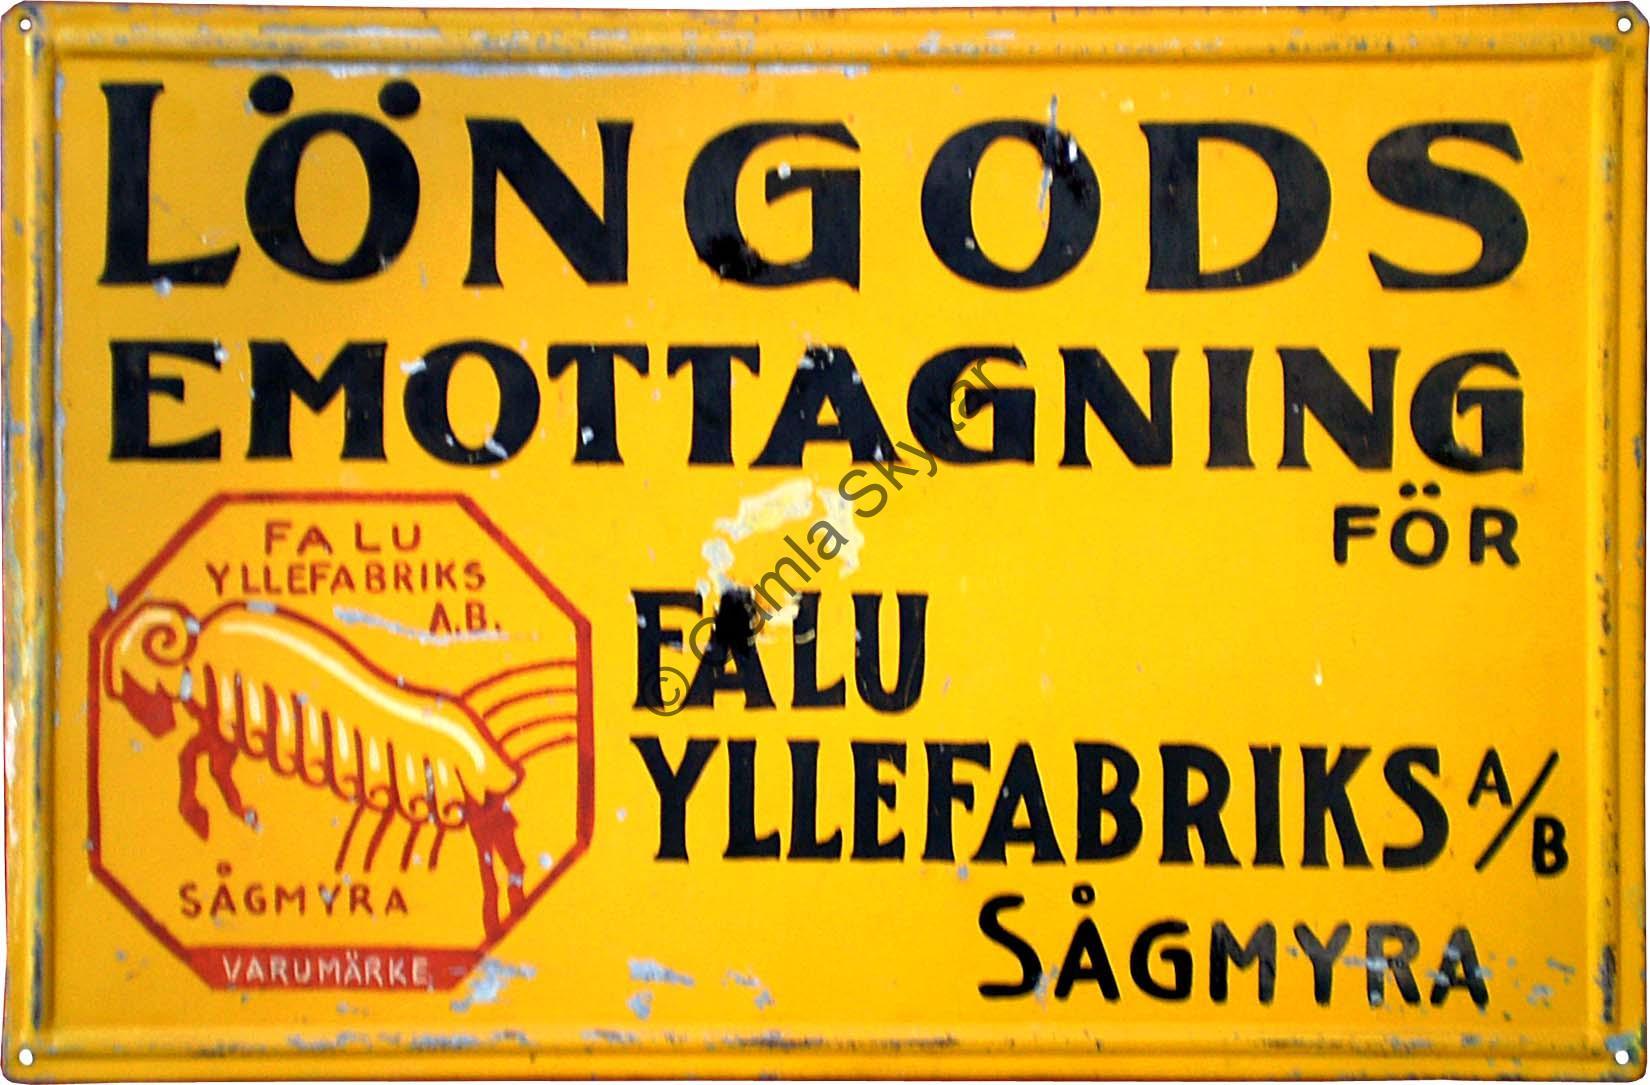 Falu Yllefabrik - Gamla Skyltar 3235168f66dbd